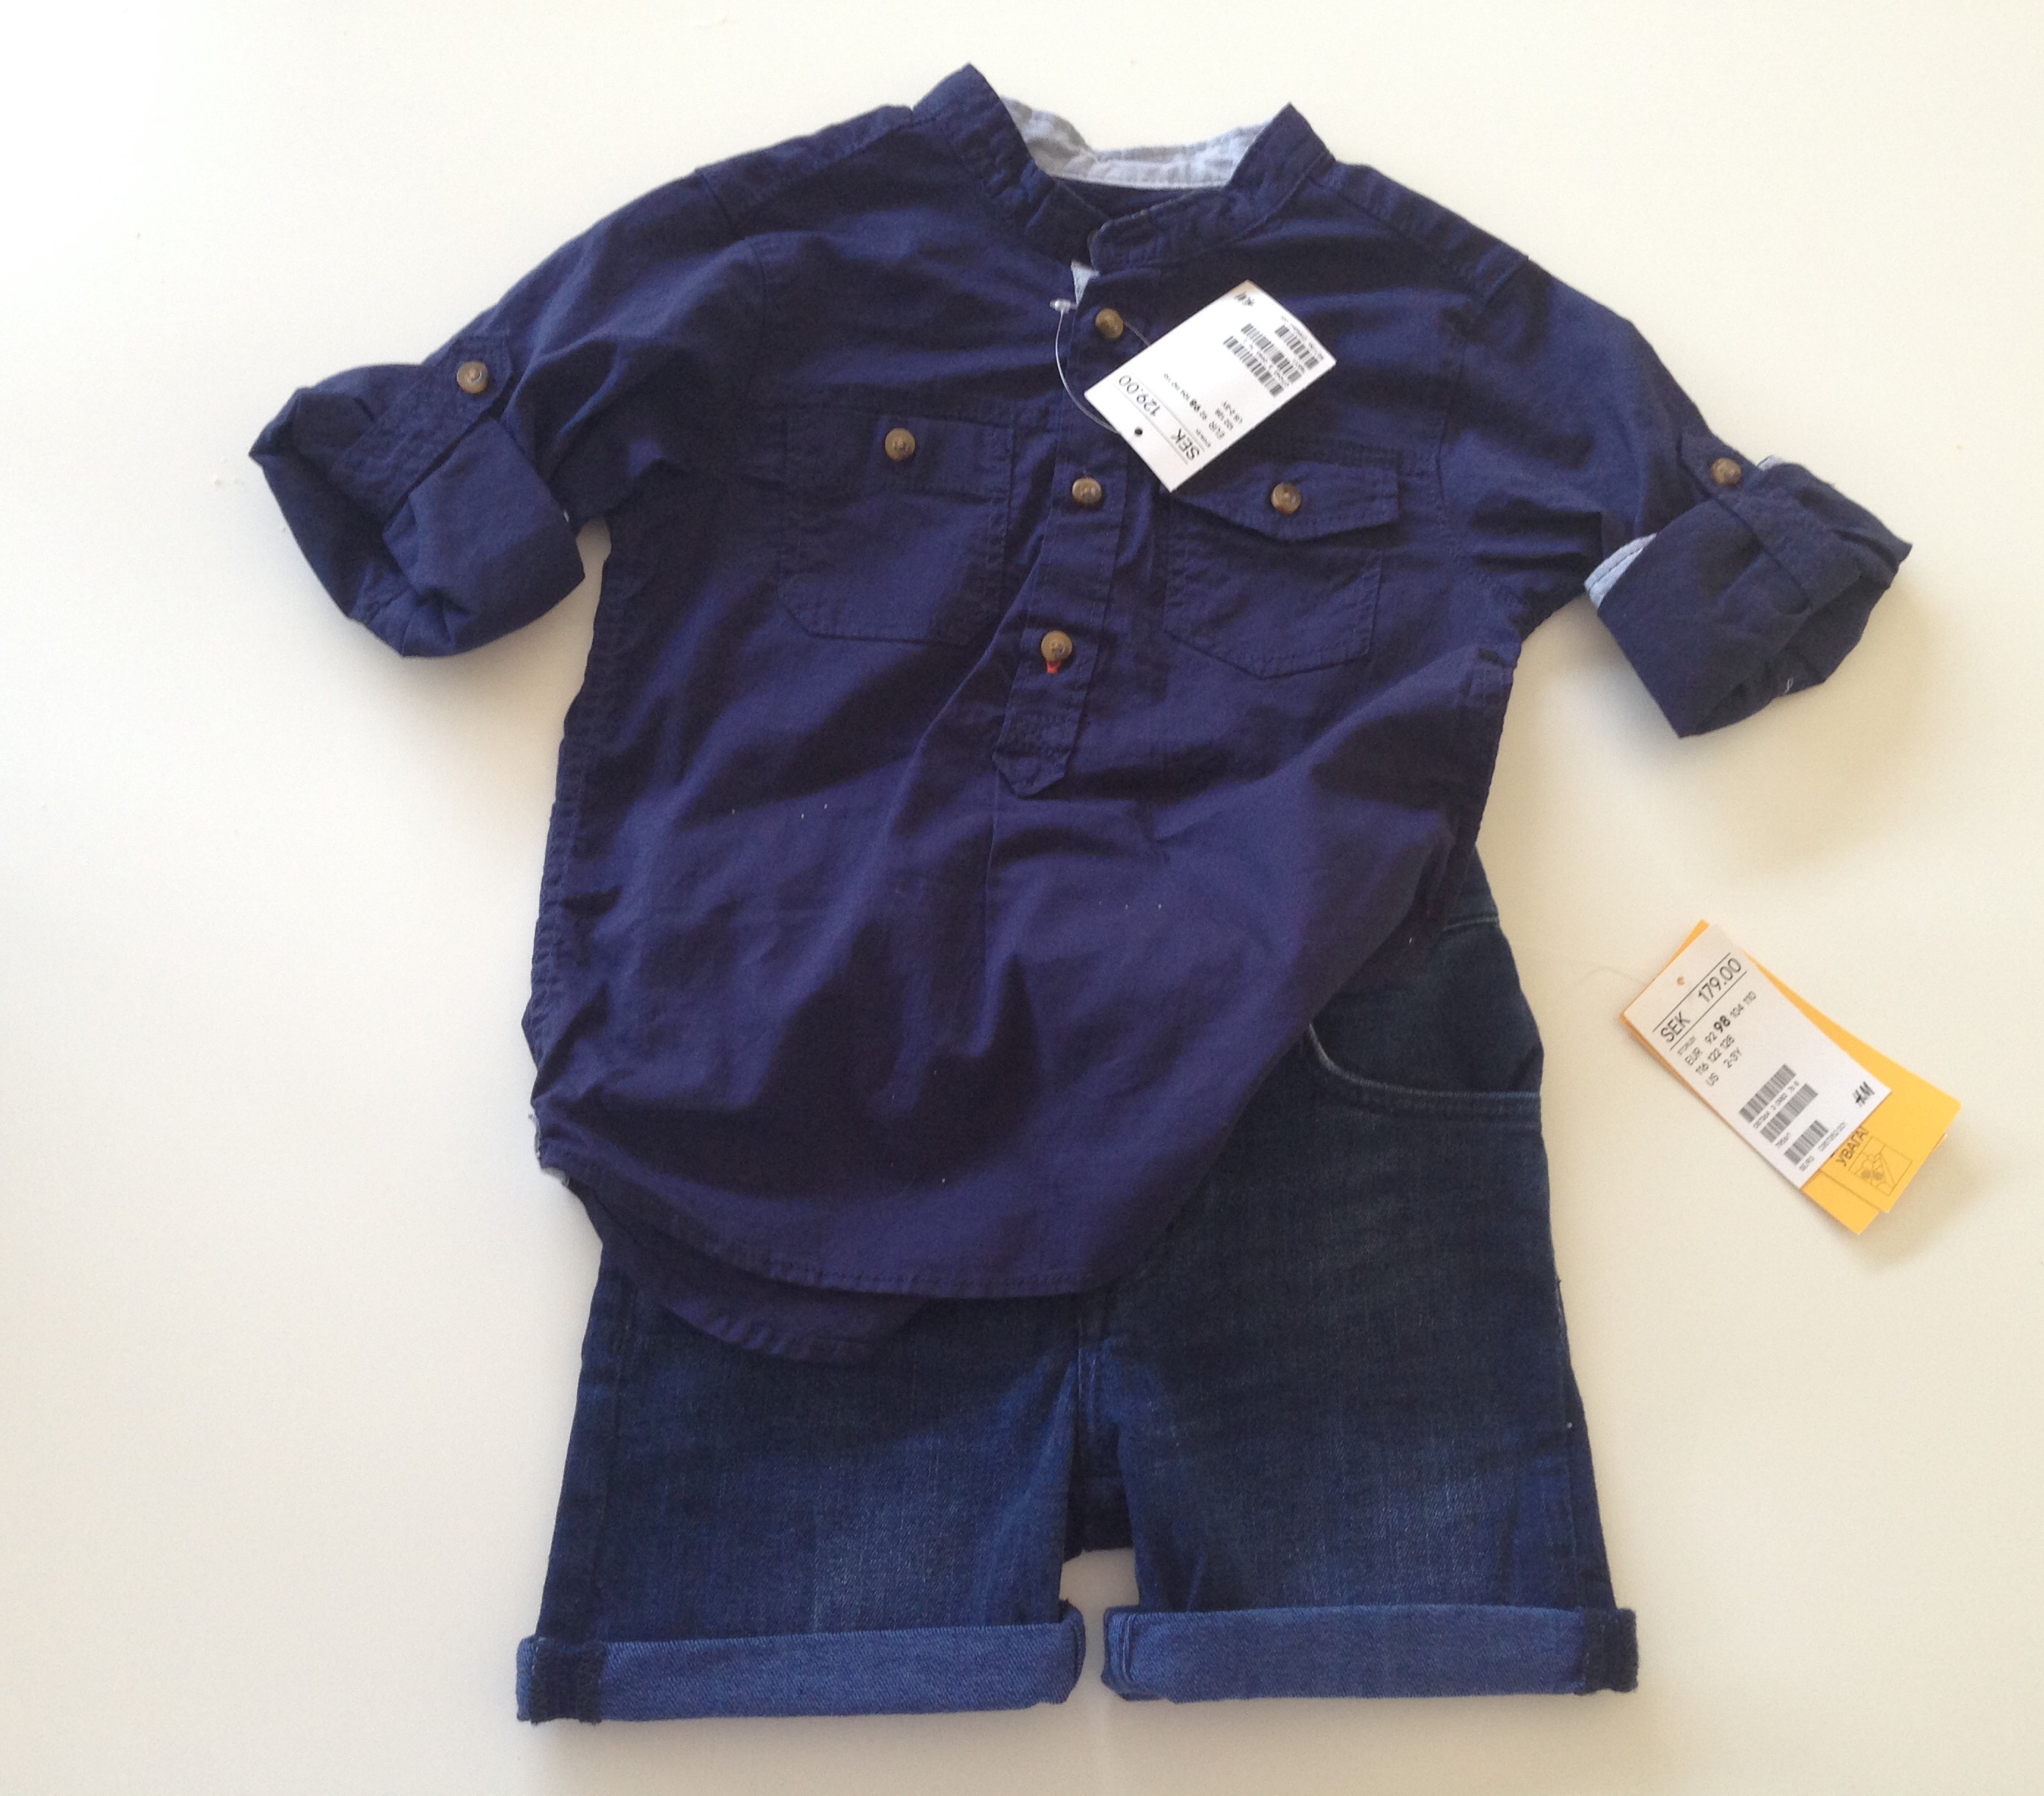 Gratis_kläder